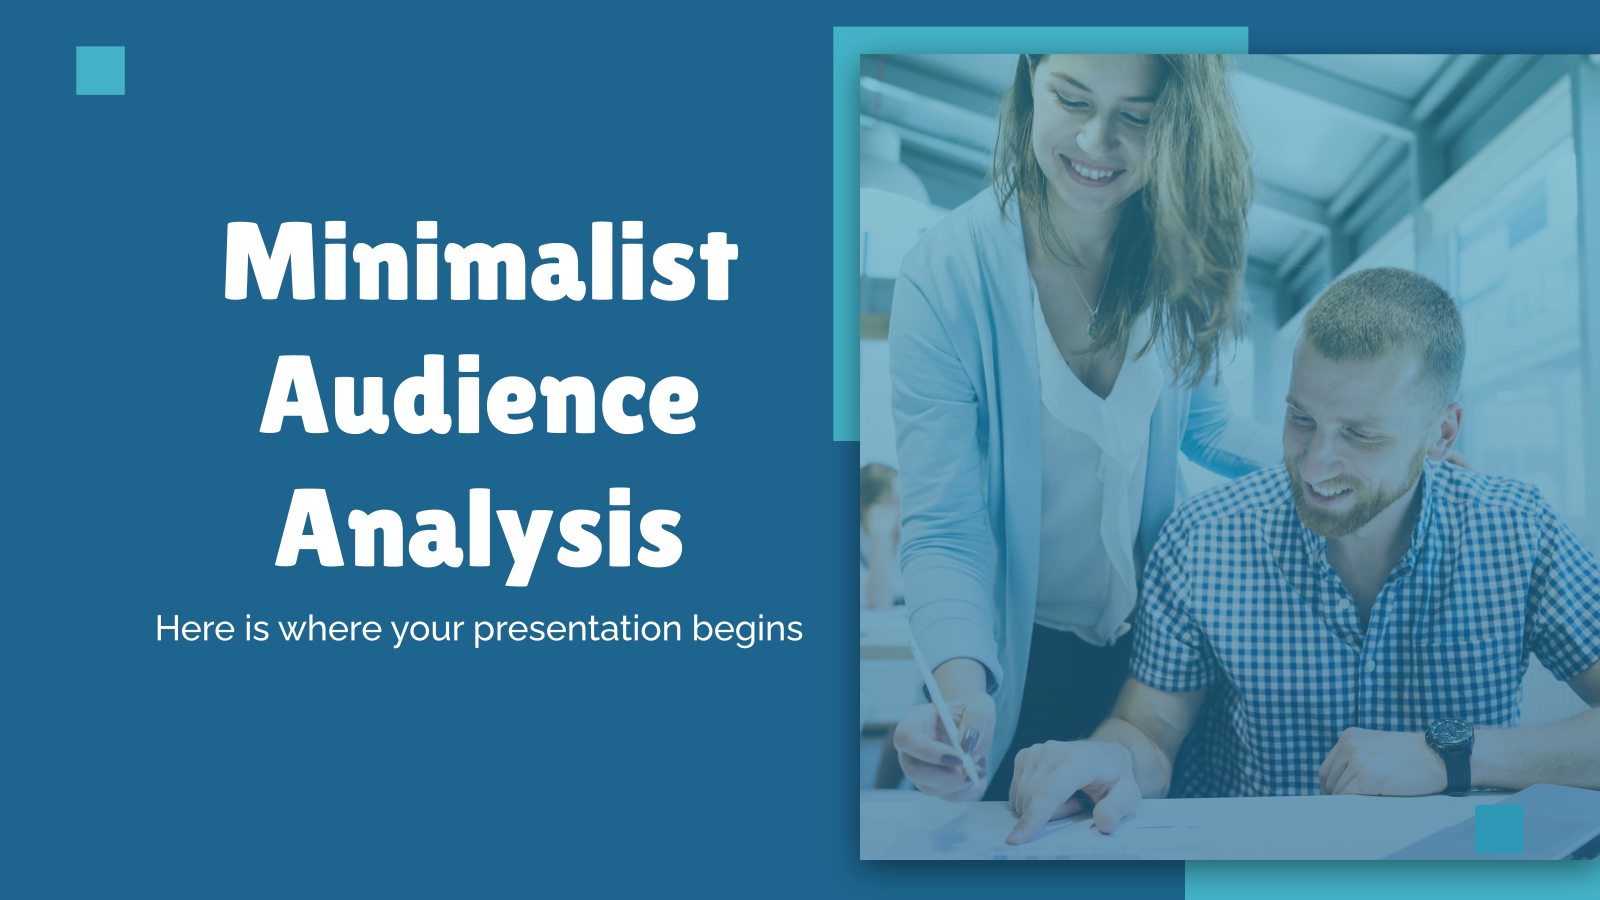 Minimalist Audience Analysis presentation template